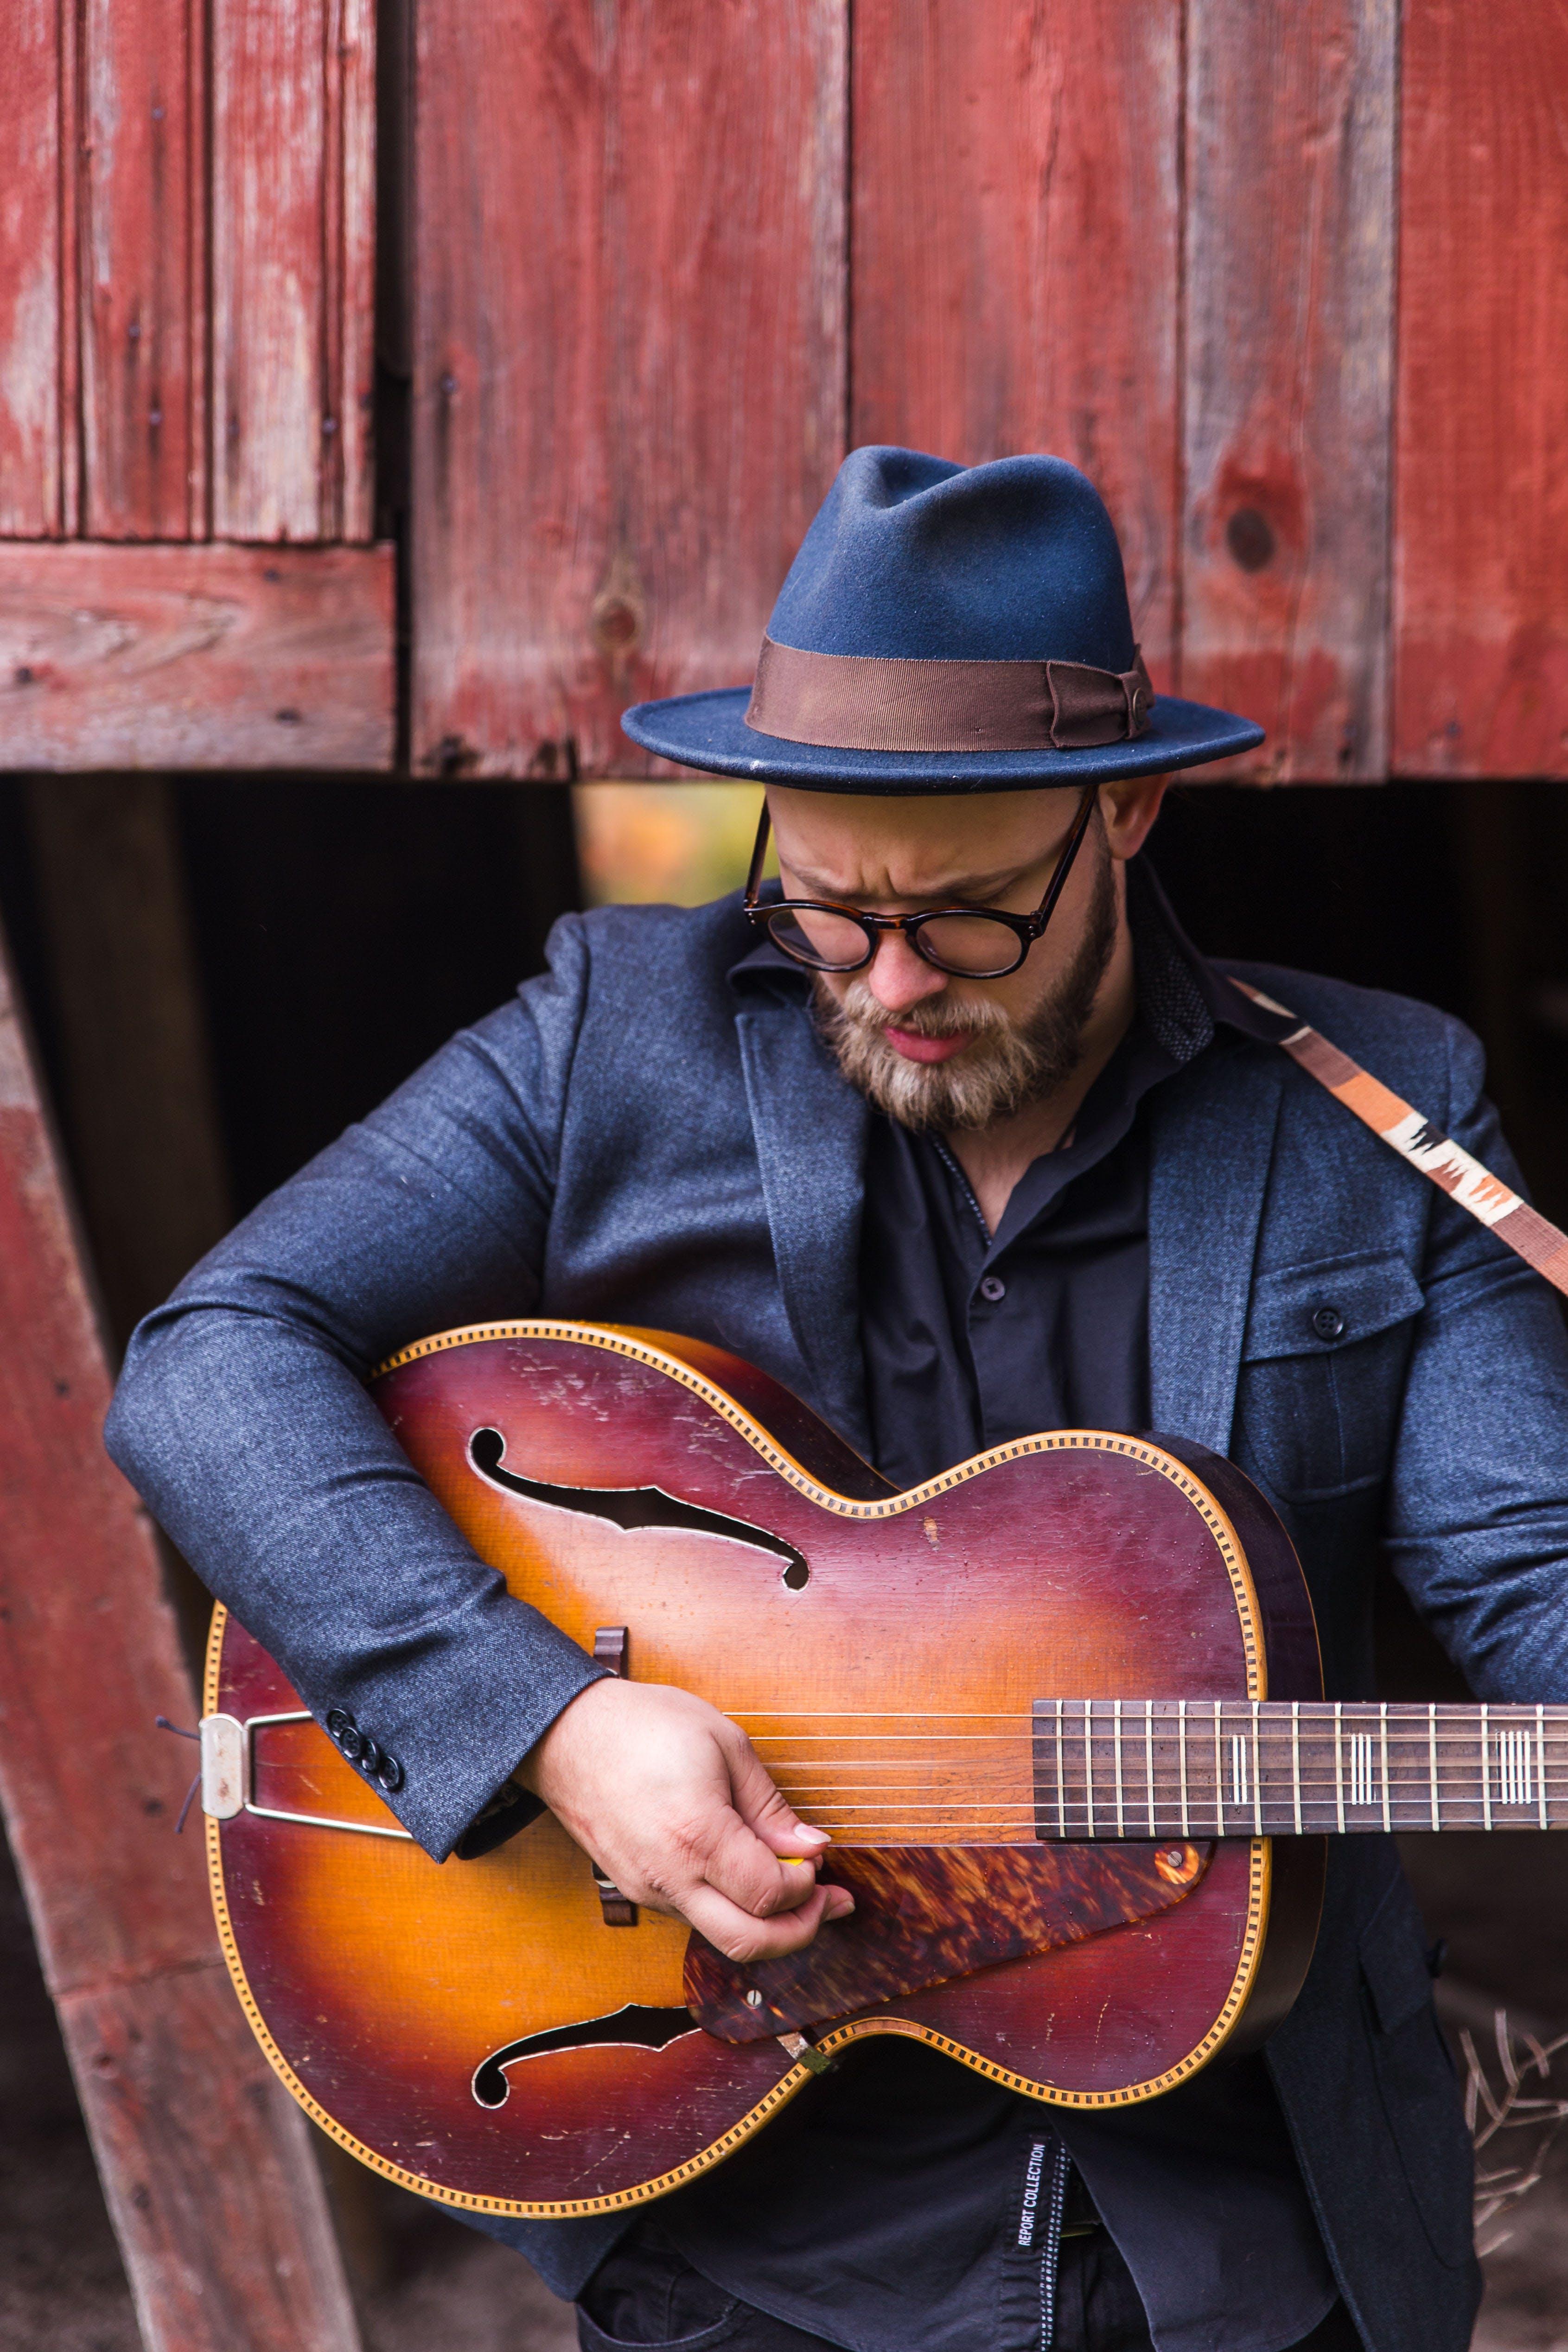 Man Holding Jazz Guitar Standing Beside Brown Wooden Wall